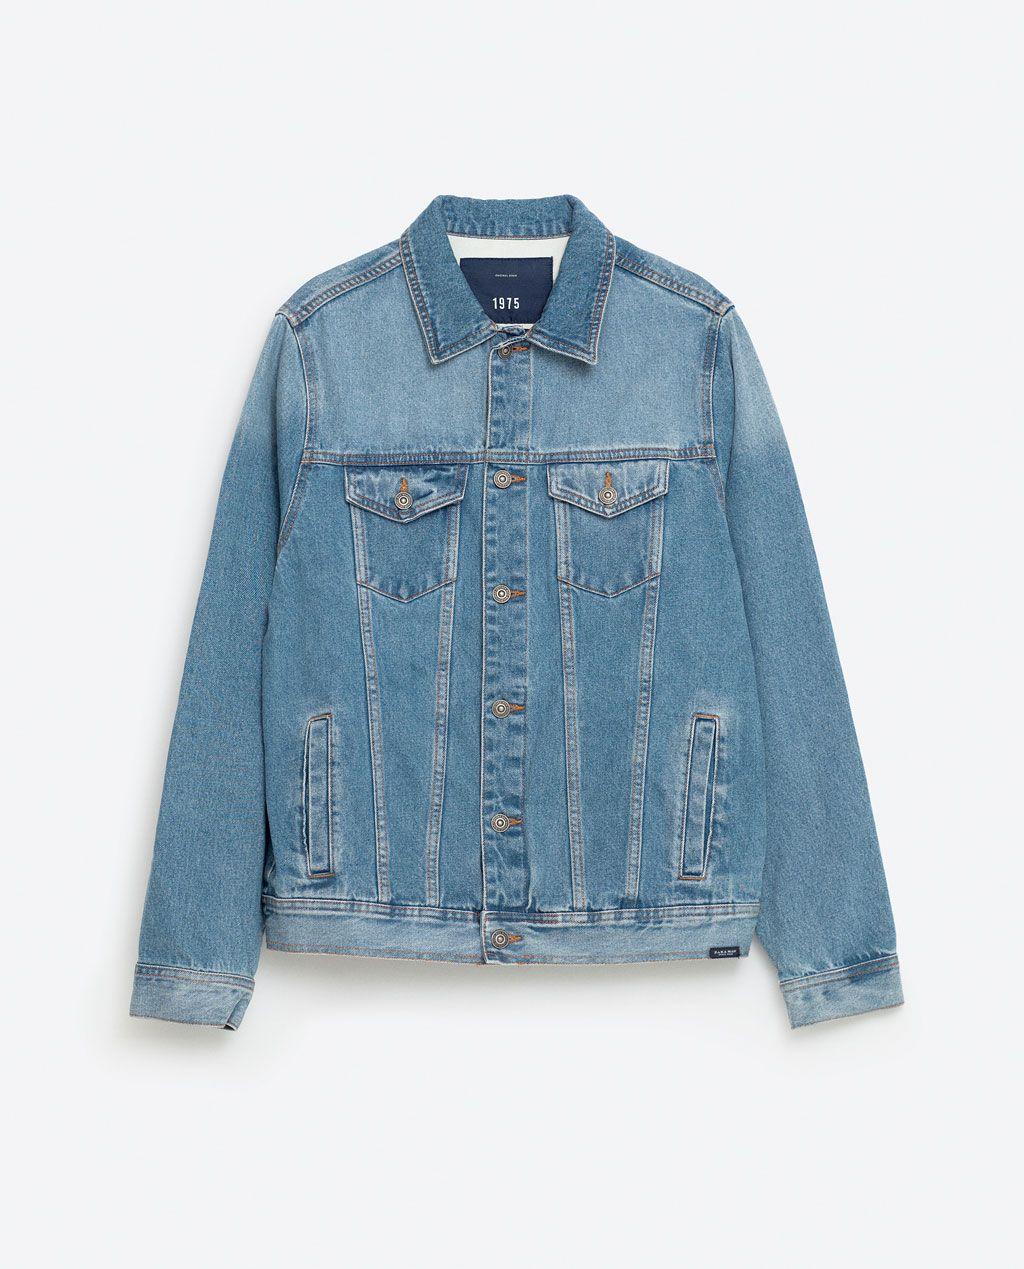 Image 8 Of Denim Jacket From Zara [ 1269 x 1024 Pixel ]